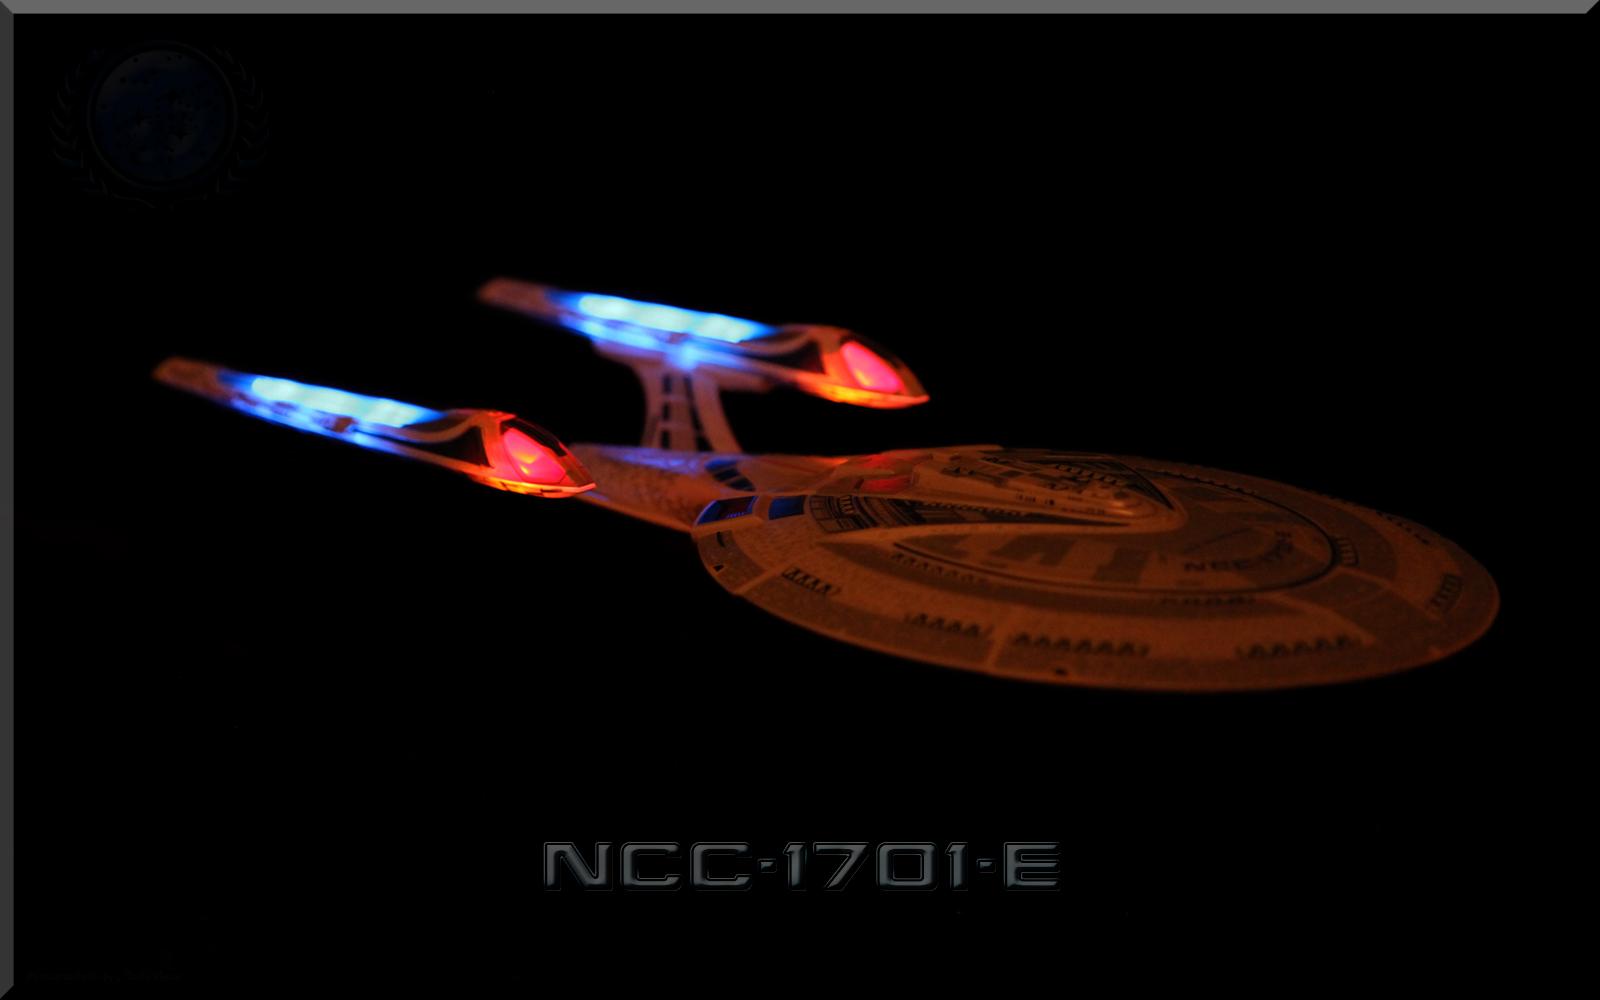 ENTERPRISE-E NCC-1701-E